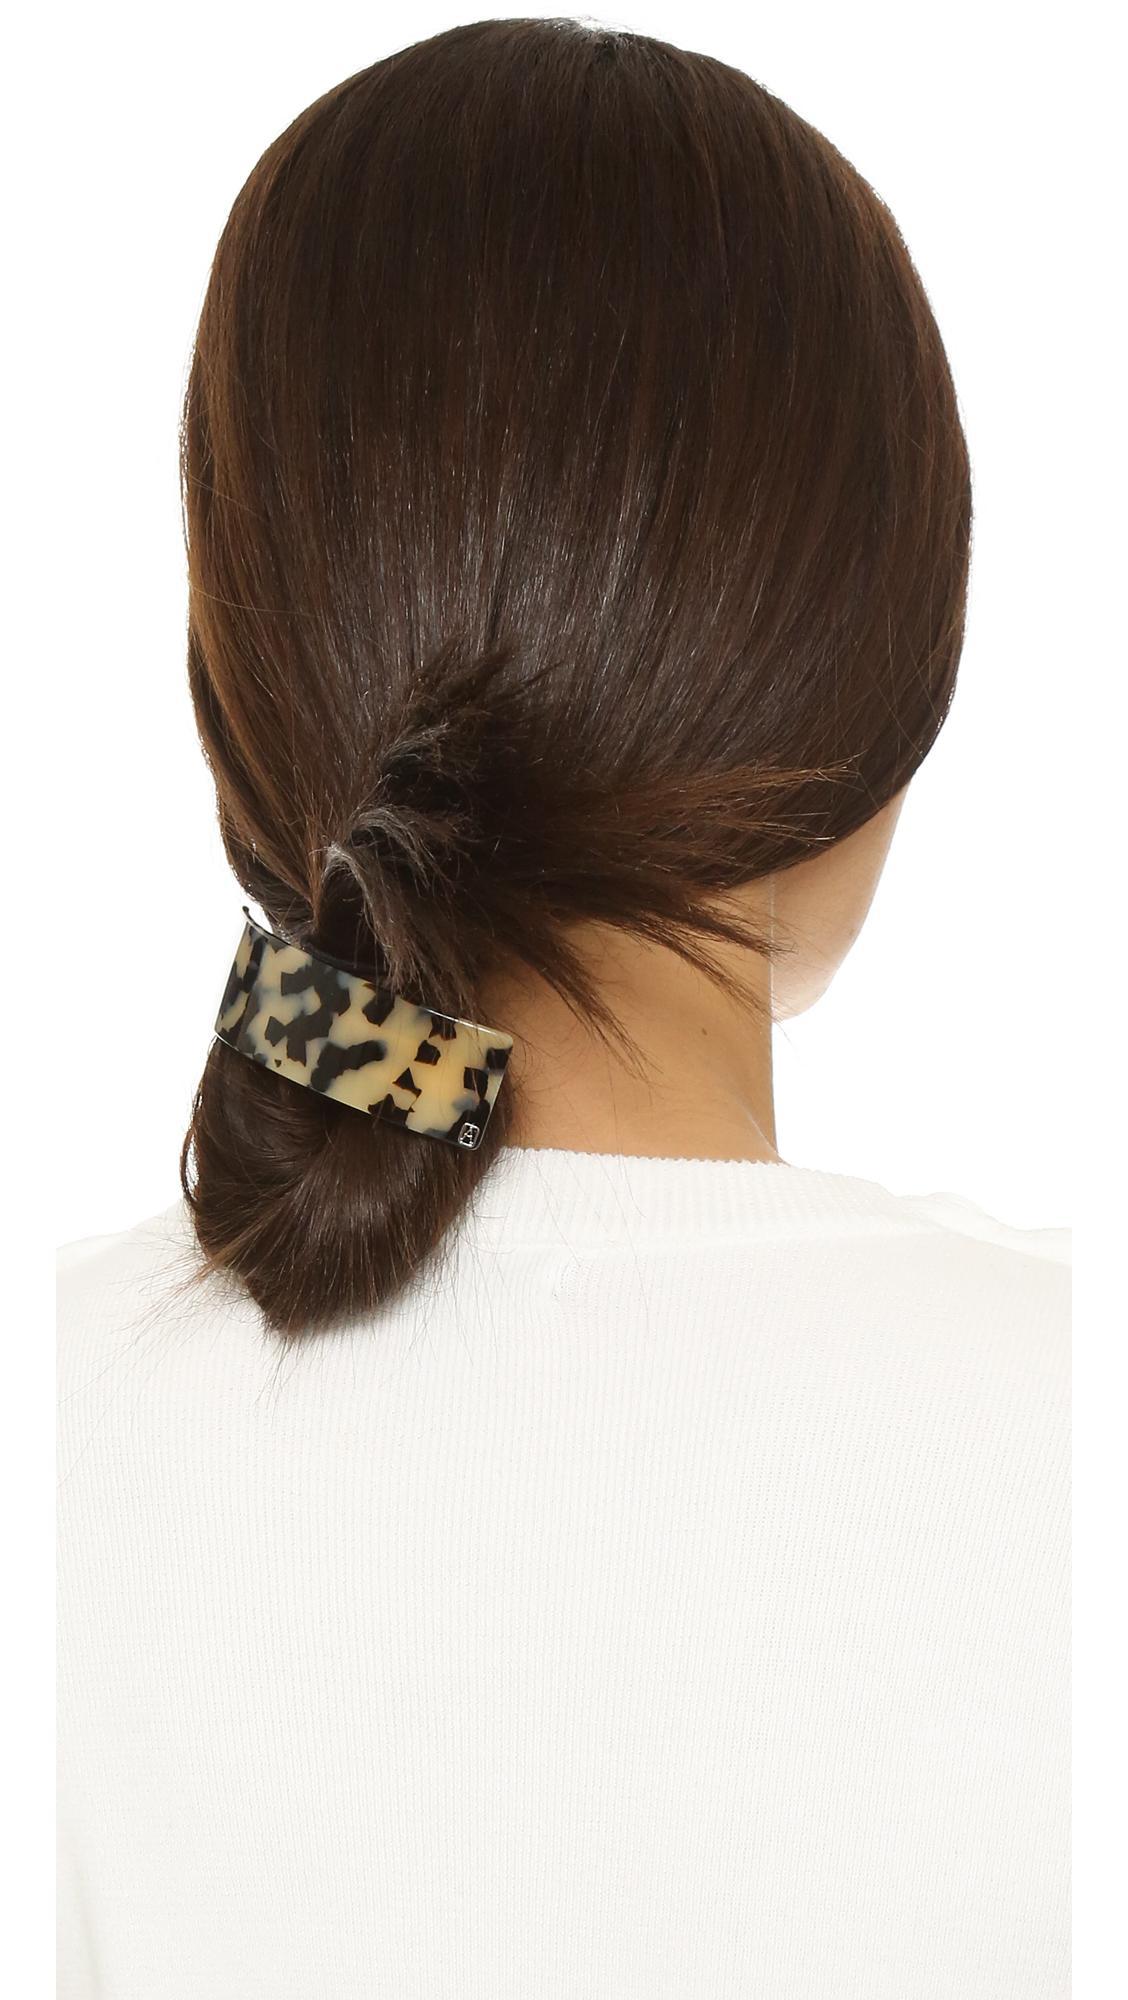 Alexandre de Paris Thick Hair Clip vFMLD